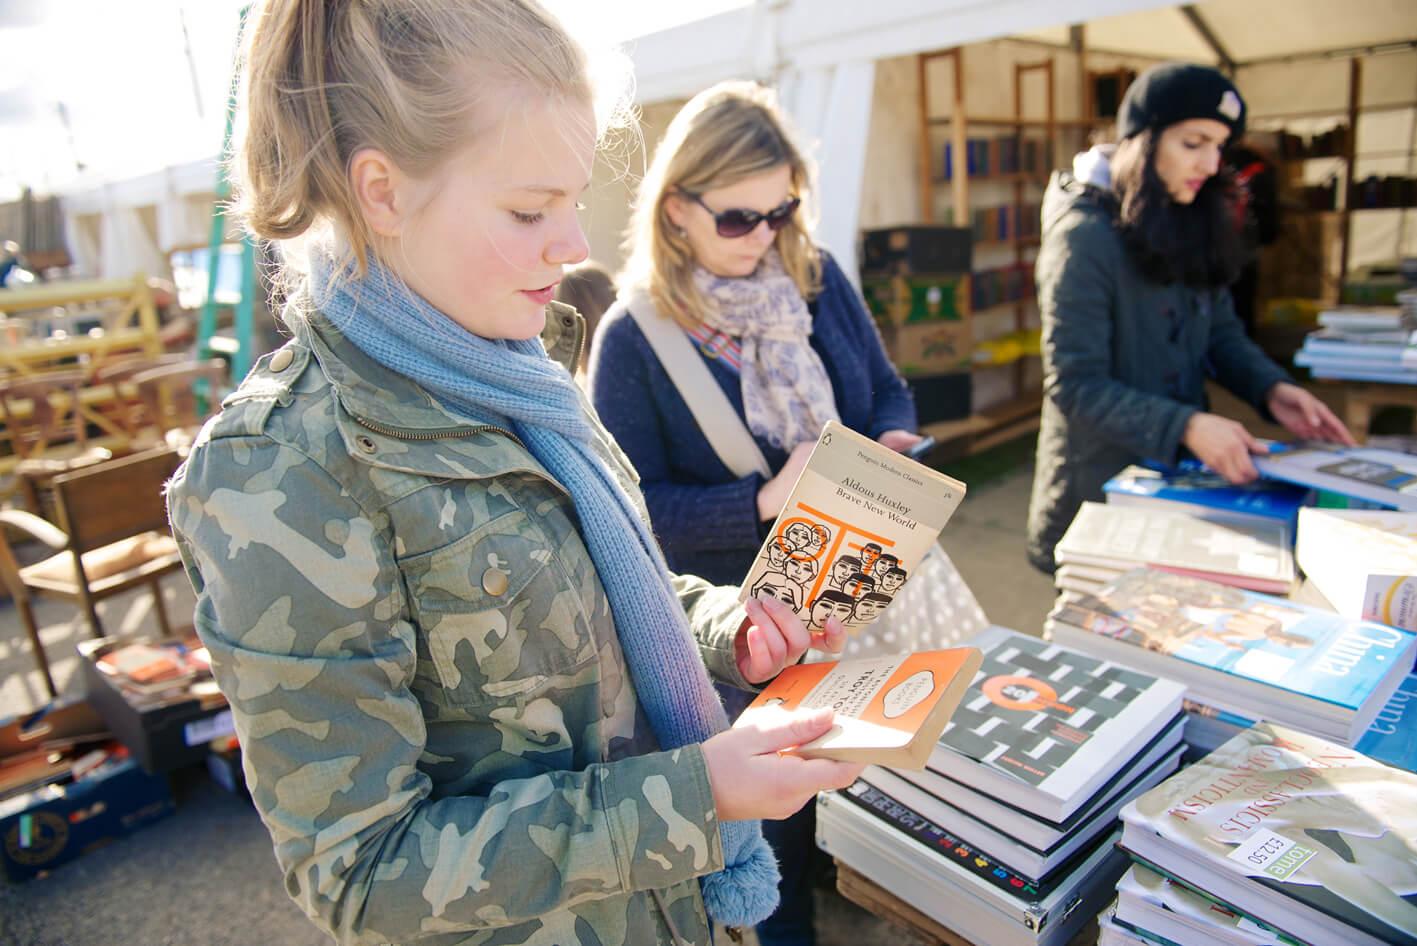 Three ladies looking at books at an antique fair